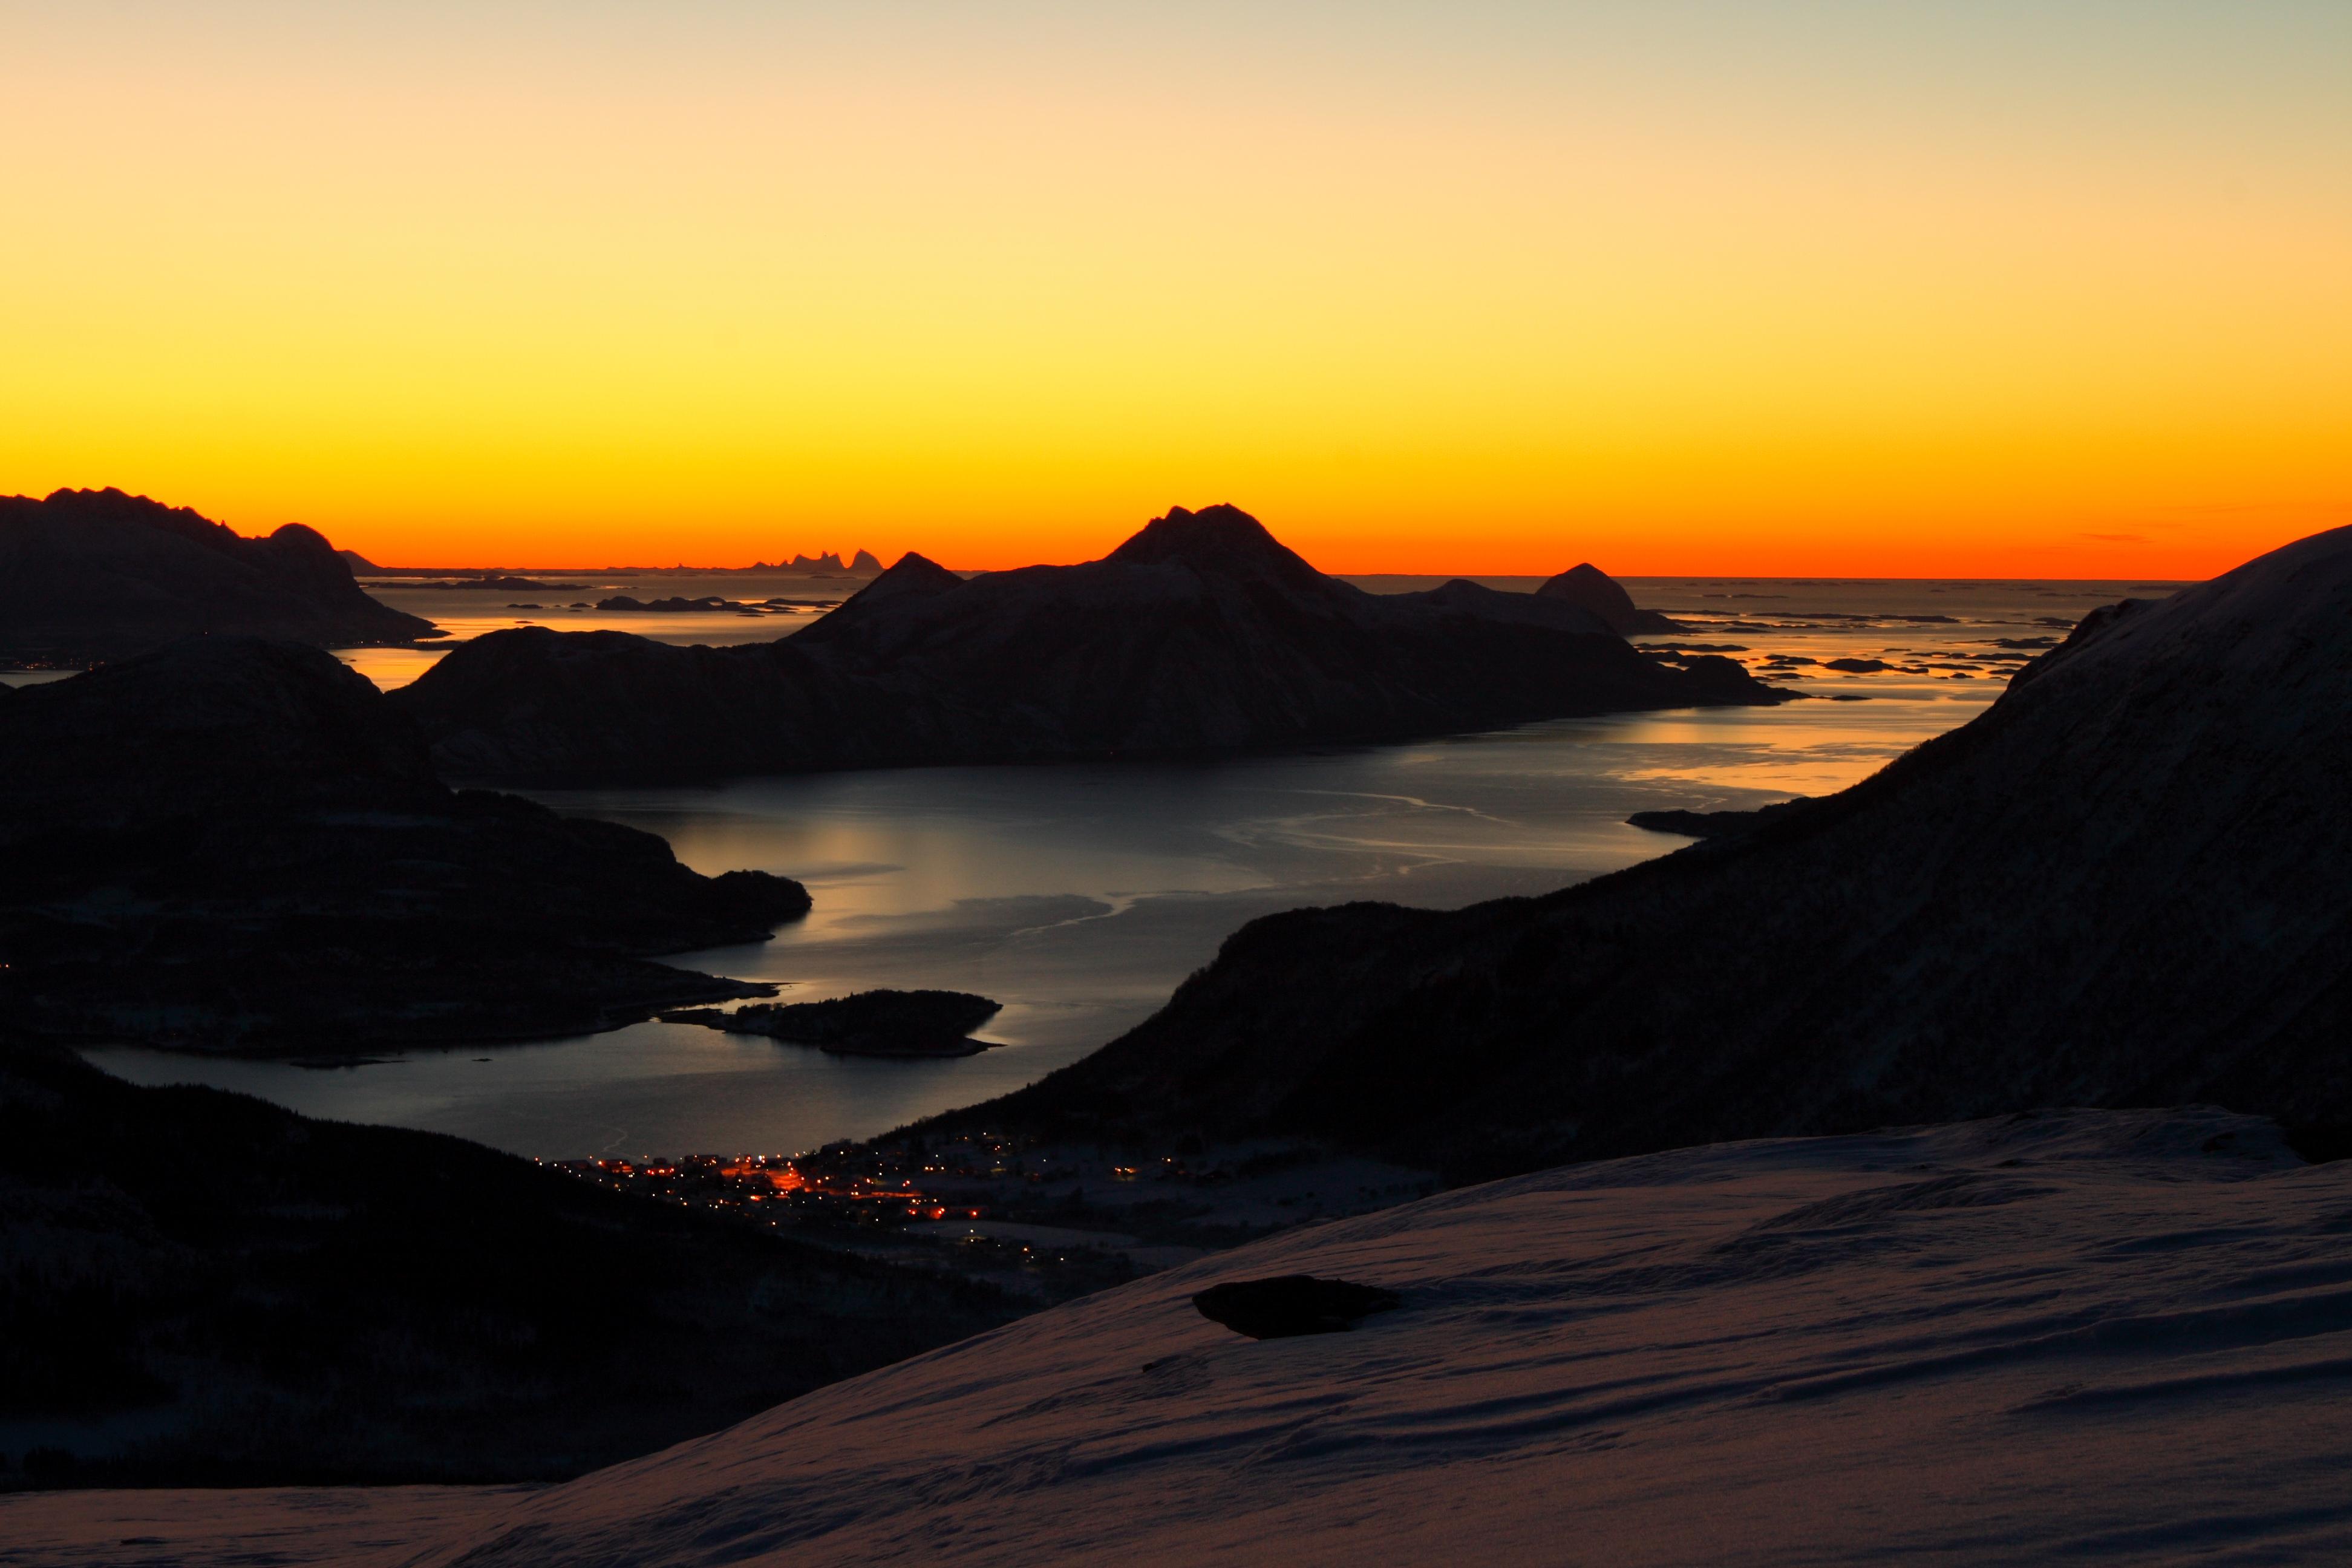 Solnedgang, Meløy